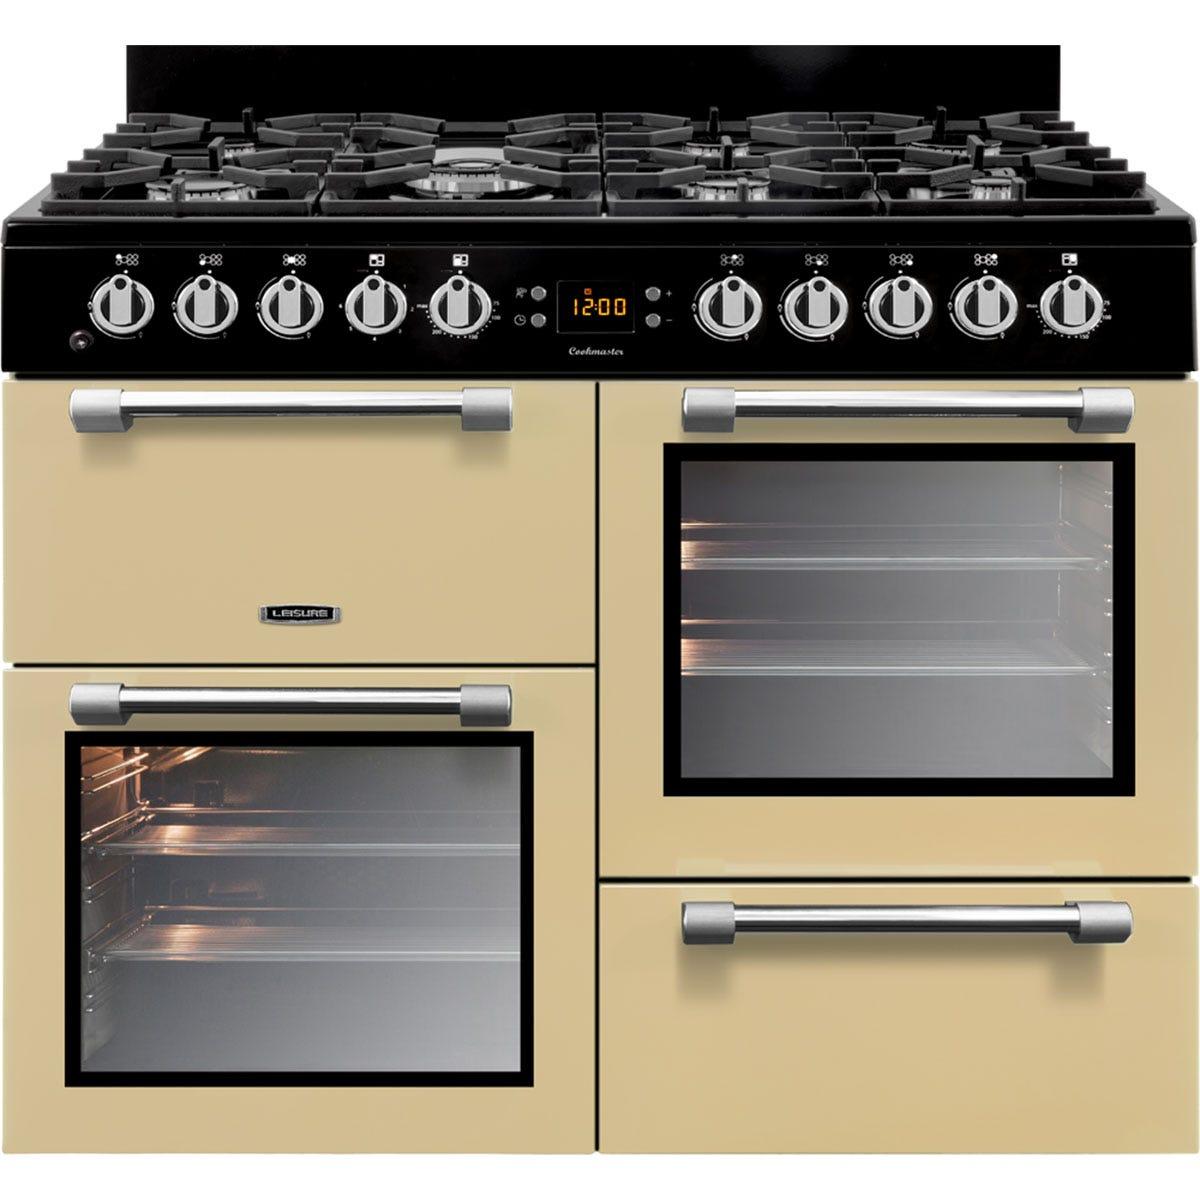 Leisure CK100G232C 100cm Cookmaster Gas Range Cooker - Cream